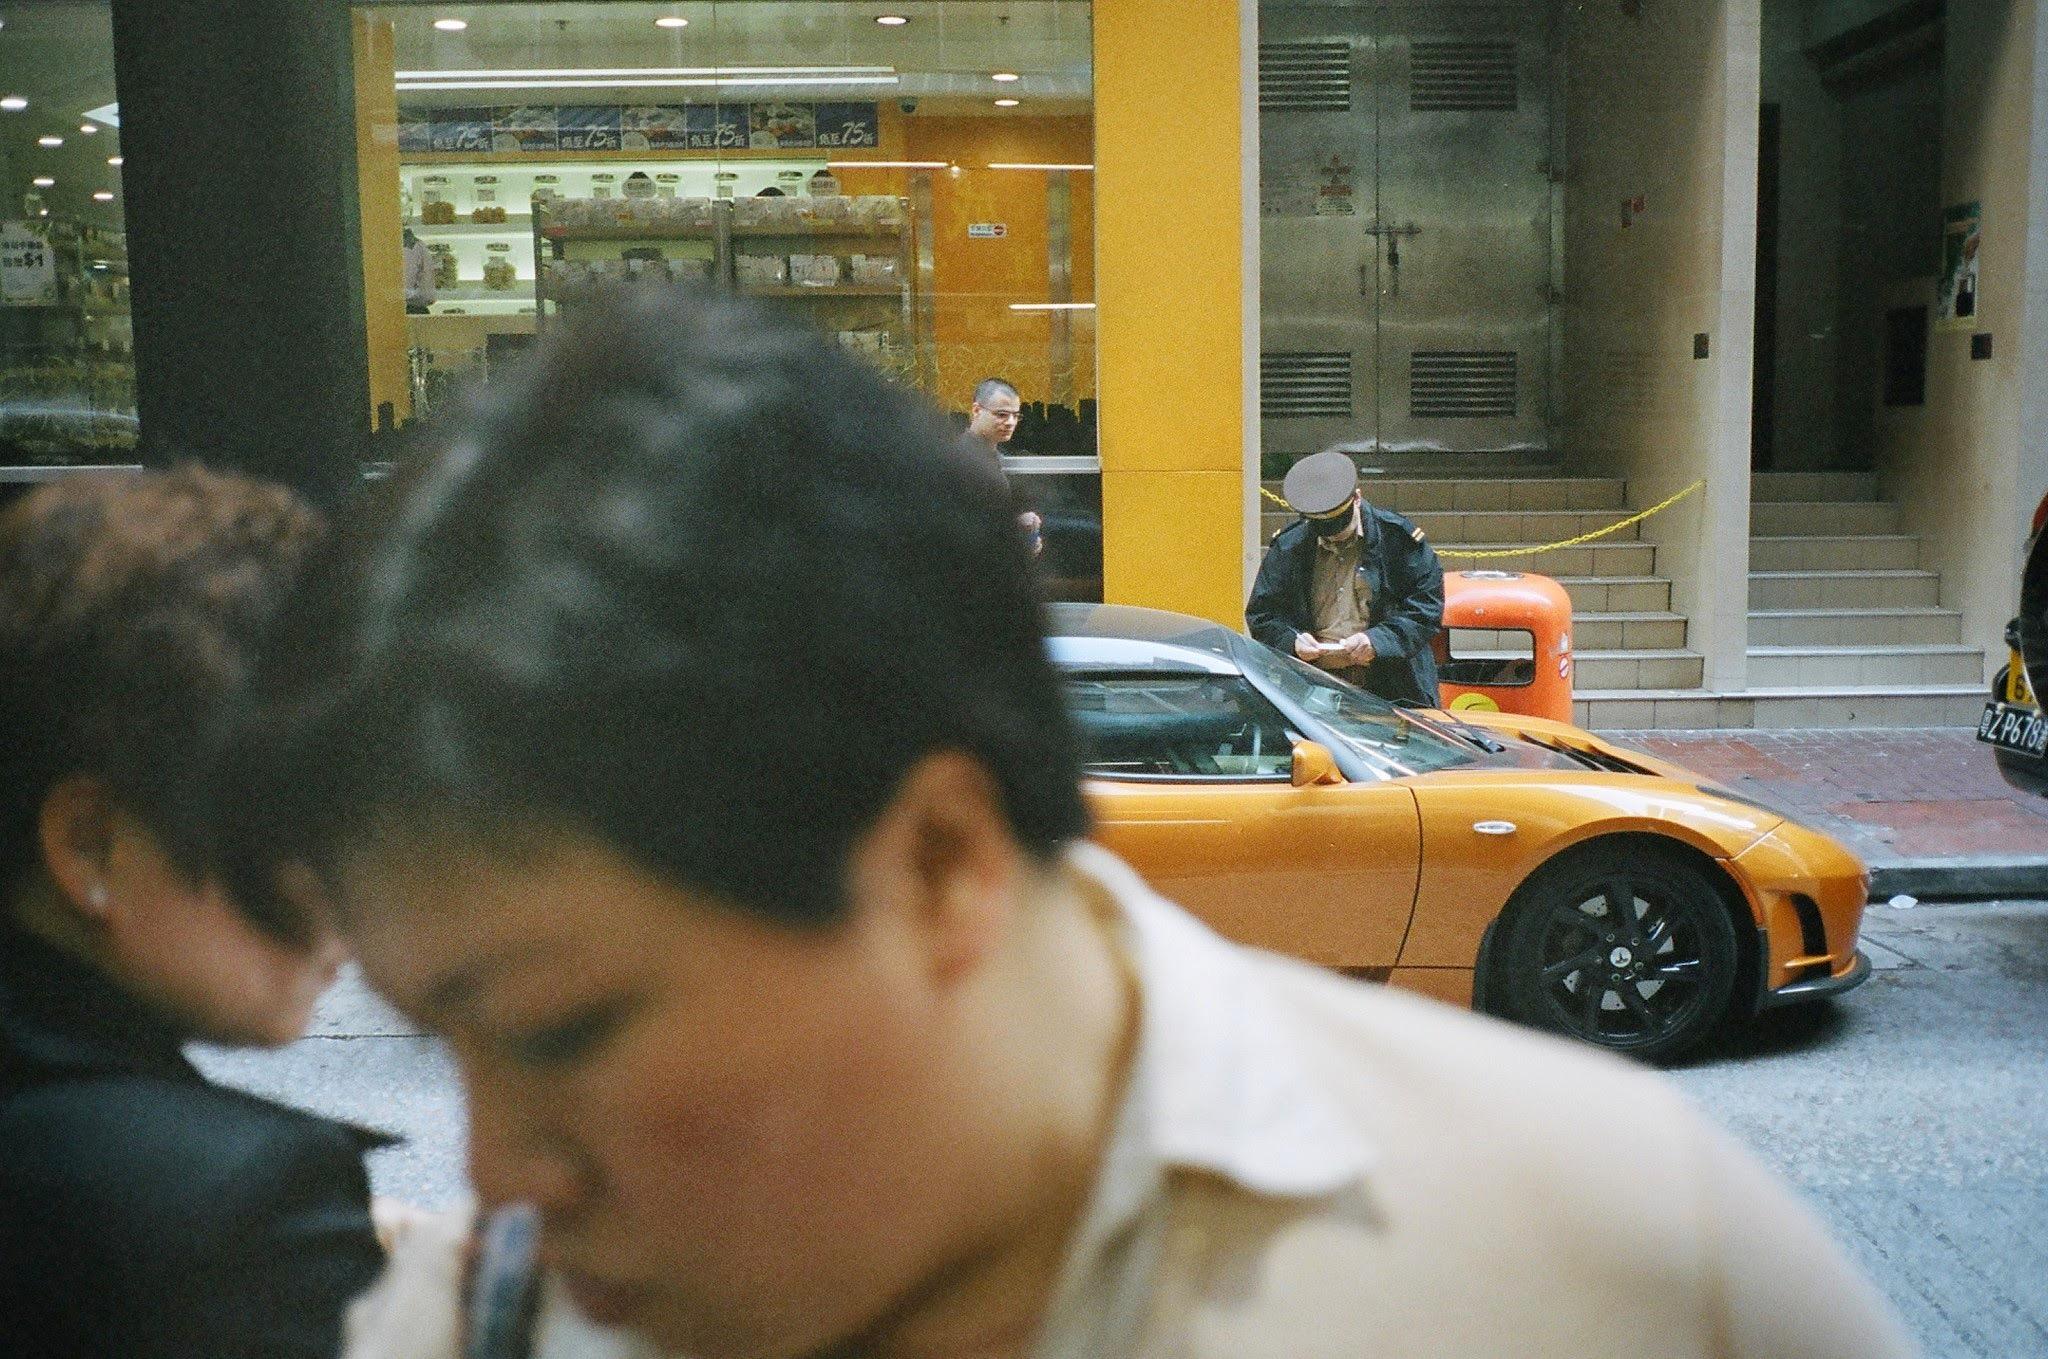 layers street photography Hong Kong mclaren PORTRA 400 by ERIC KIM 4